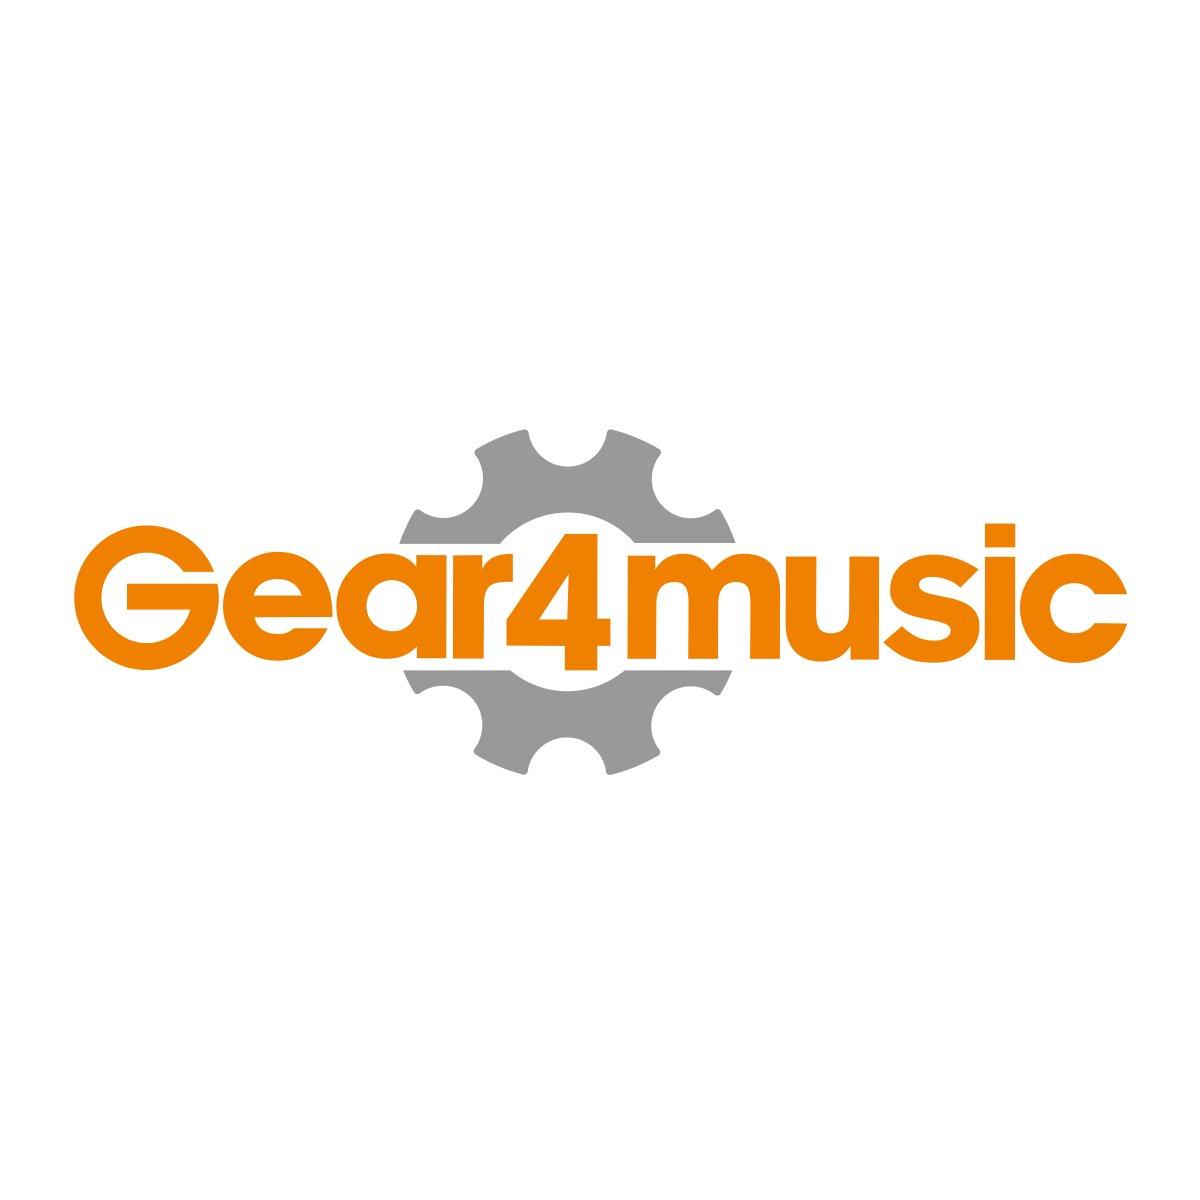 acoustic guitar sale gear4music. Black Bedroom Furniture Sets. Home Design Ideas